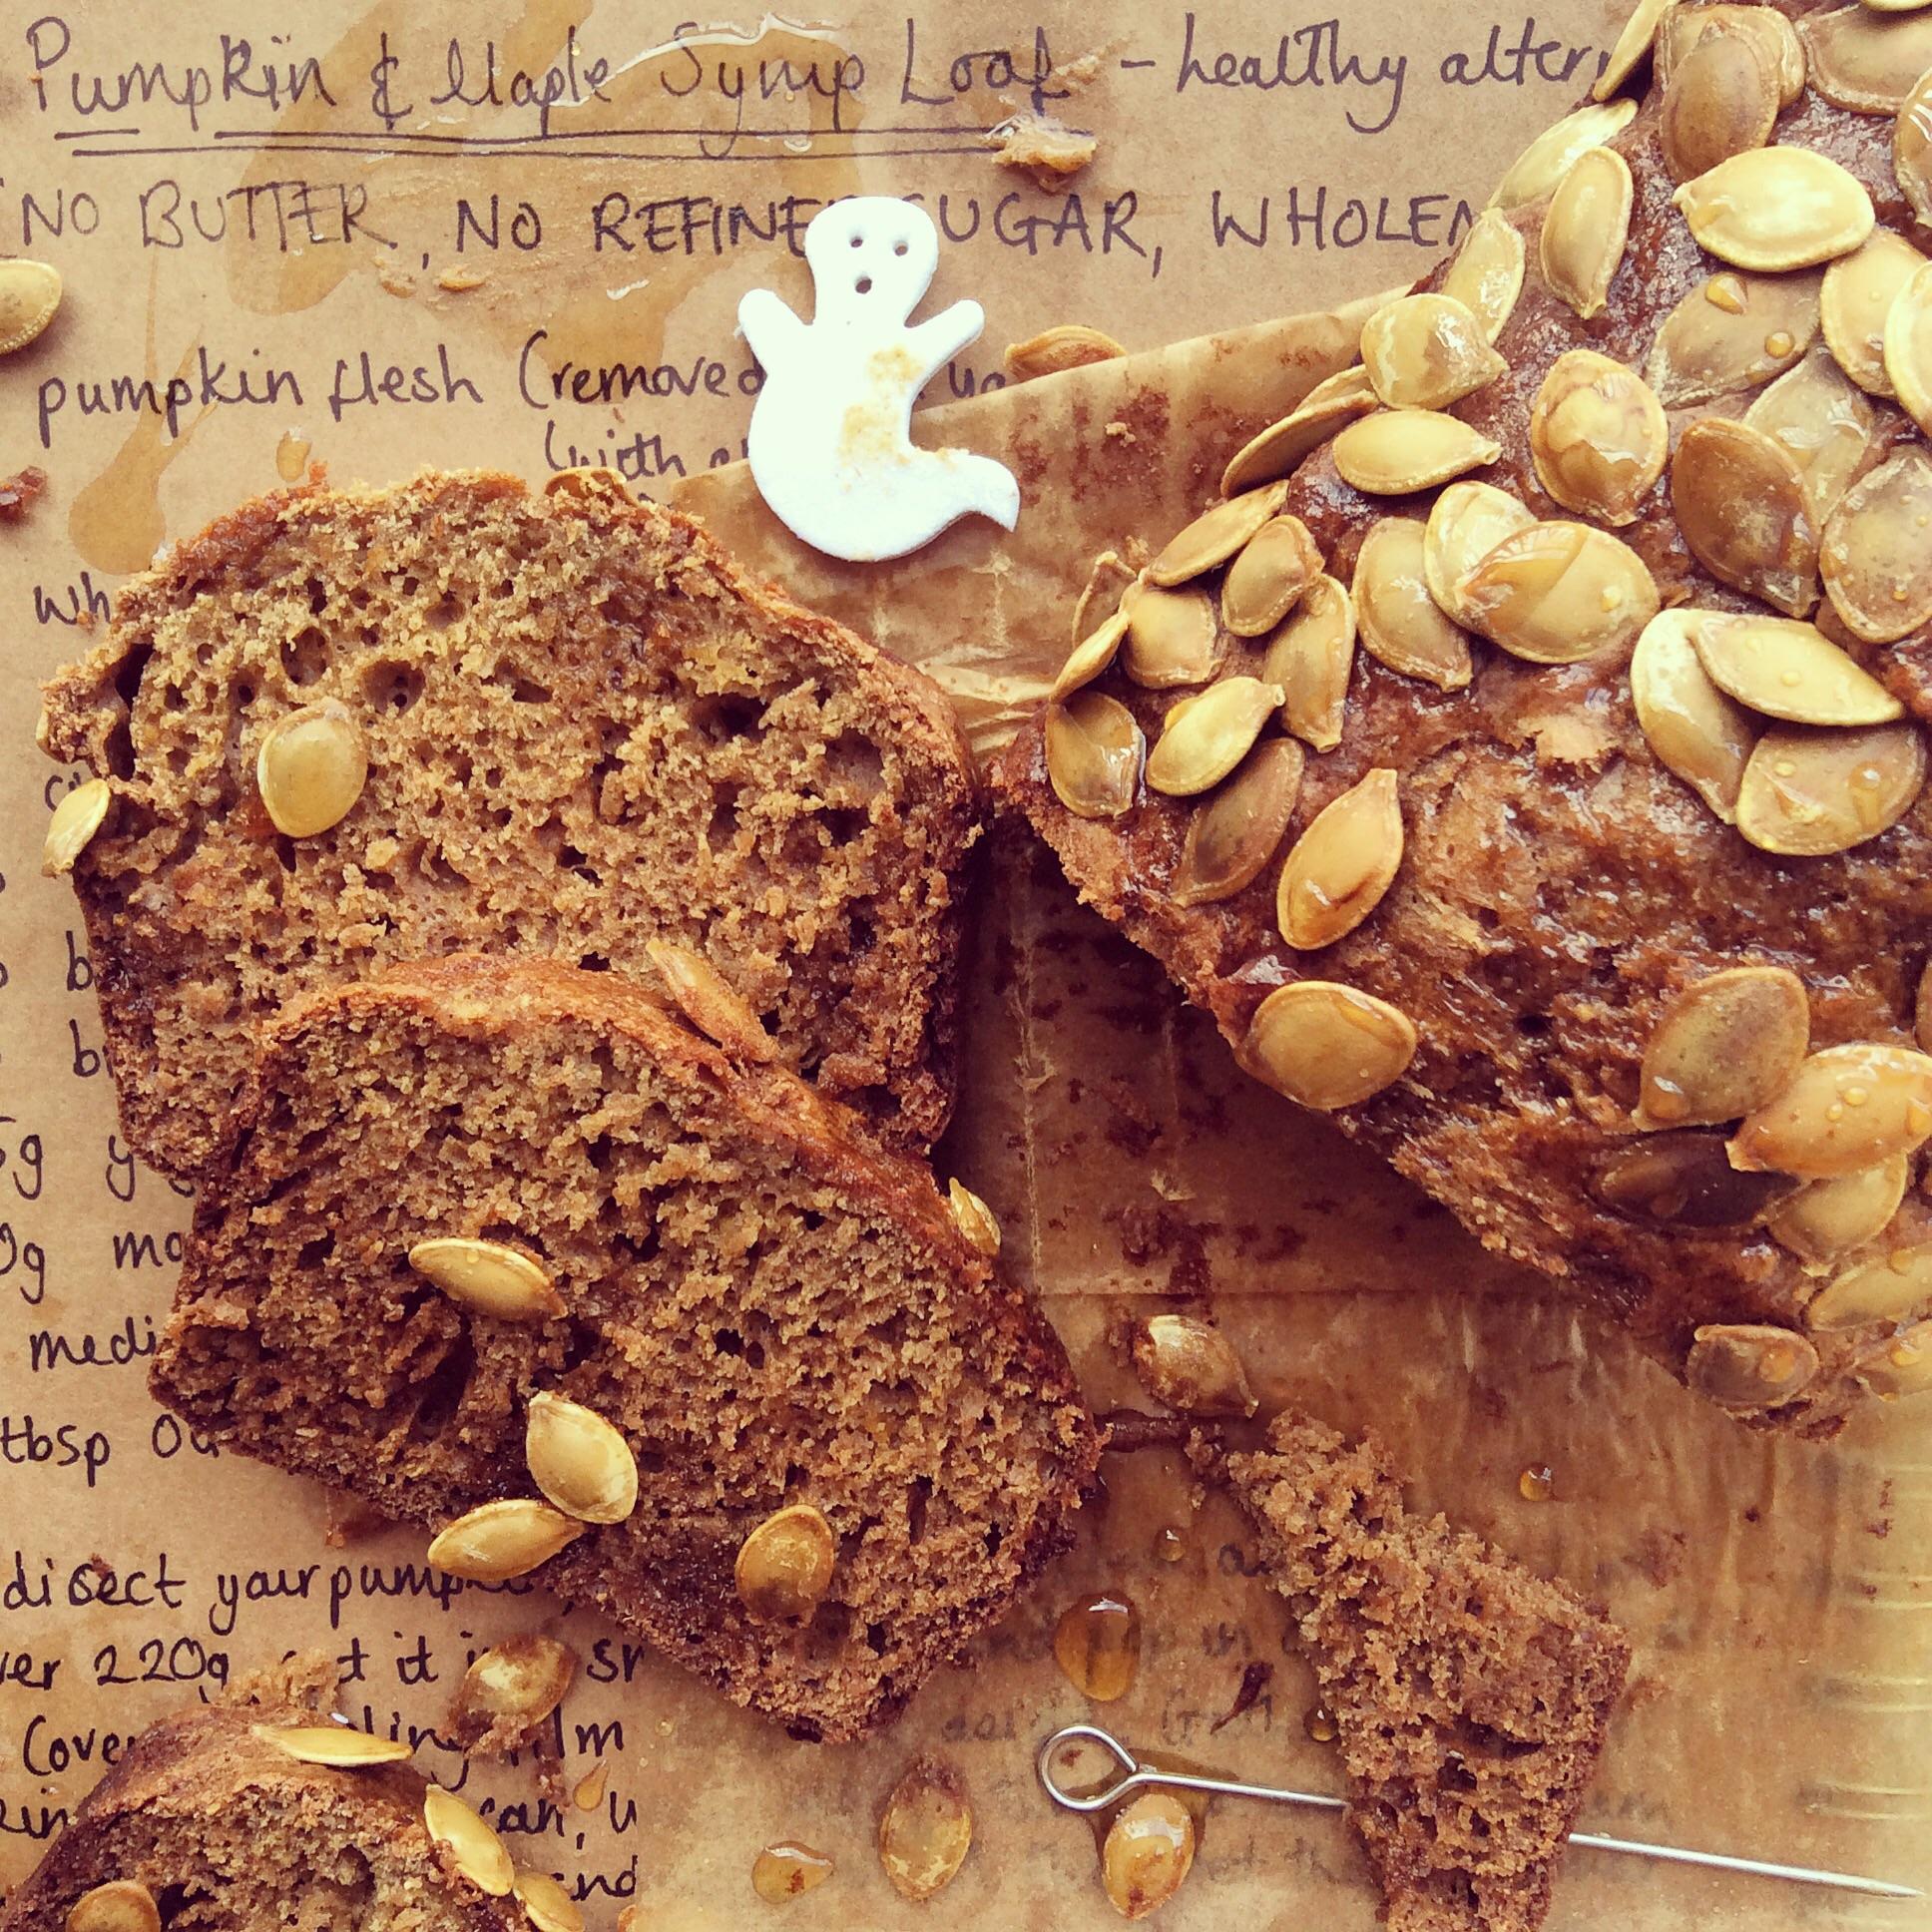 Healthy Halloween Baking - Pumpkin & Maple Syrup Loaf